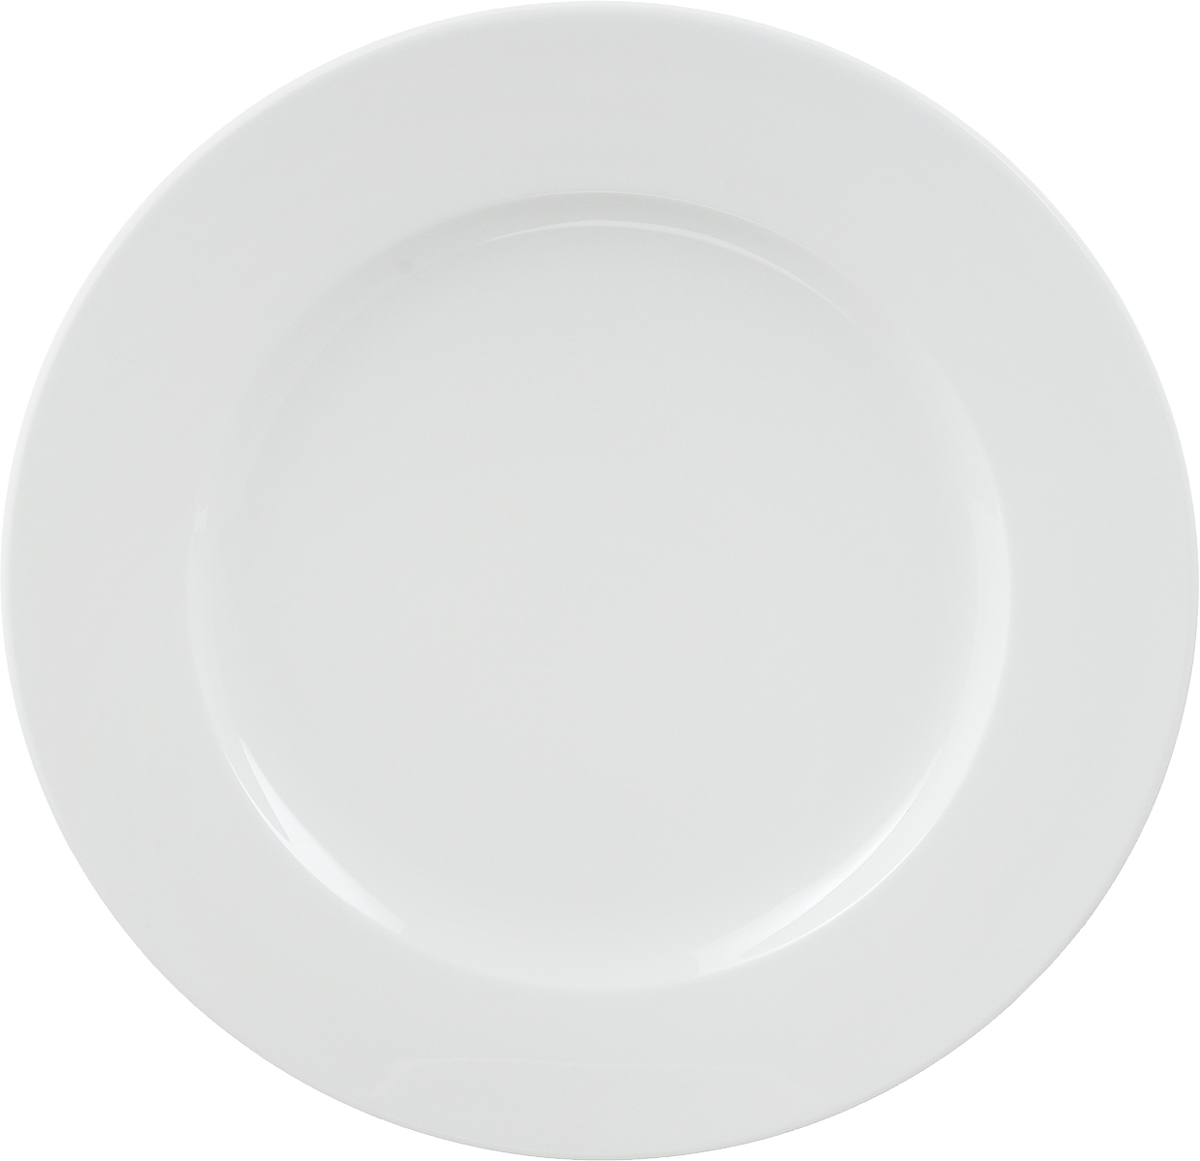 Тарелка мелкая Ariane Прайм, диаметр 31 см